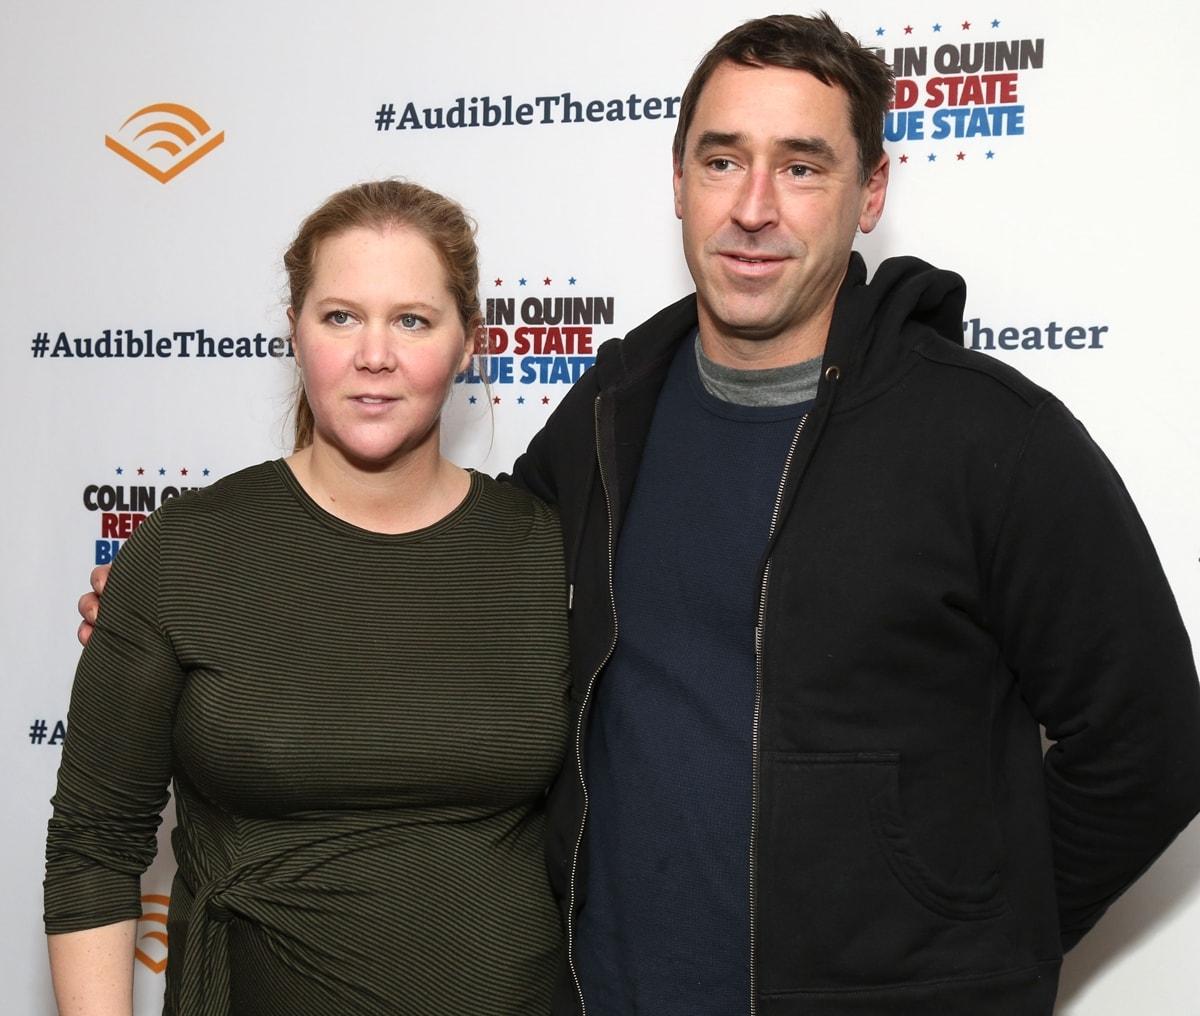 Amy Schumer met Chris Fischer during a weekend in Martha's Vineyard